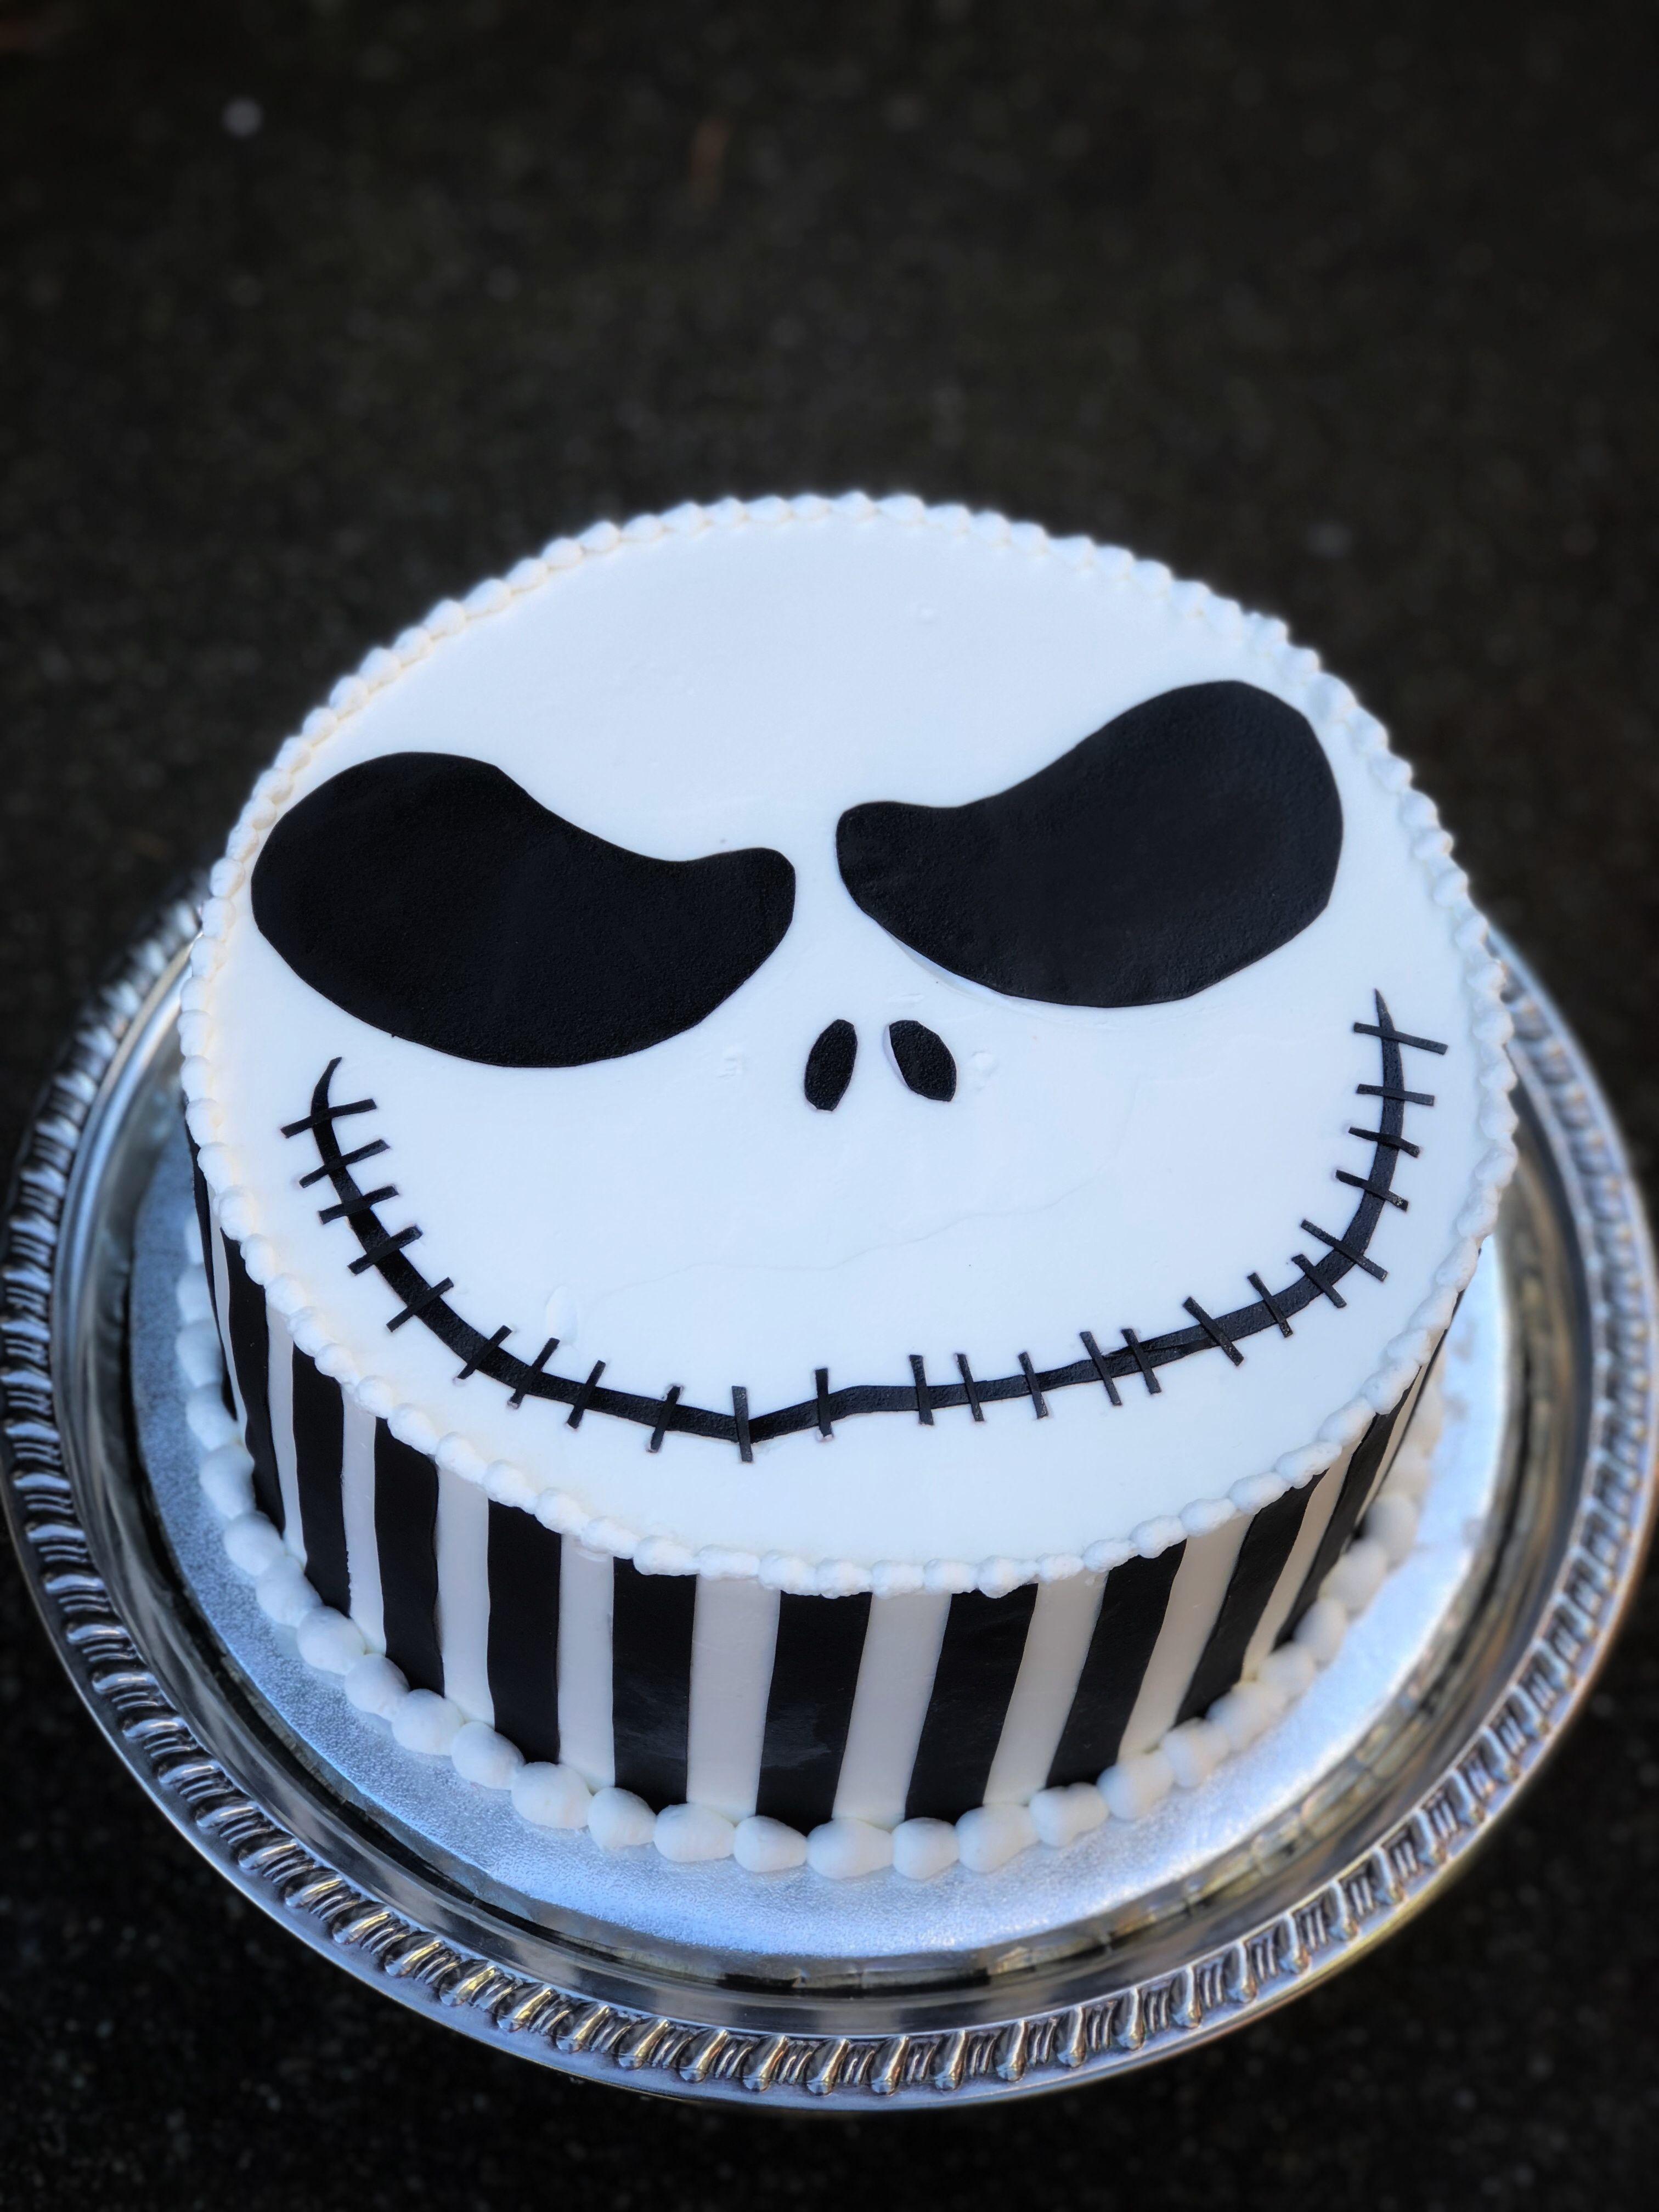 Simple Jack Skellington Cake With Images Halloween Cake